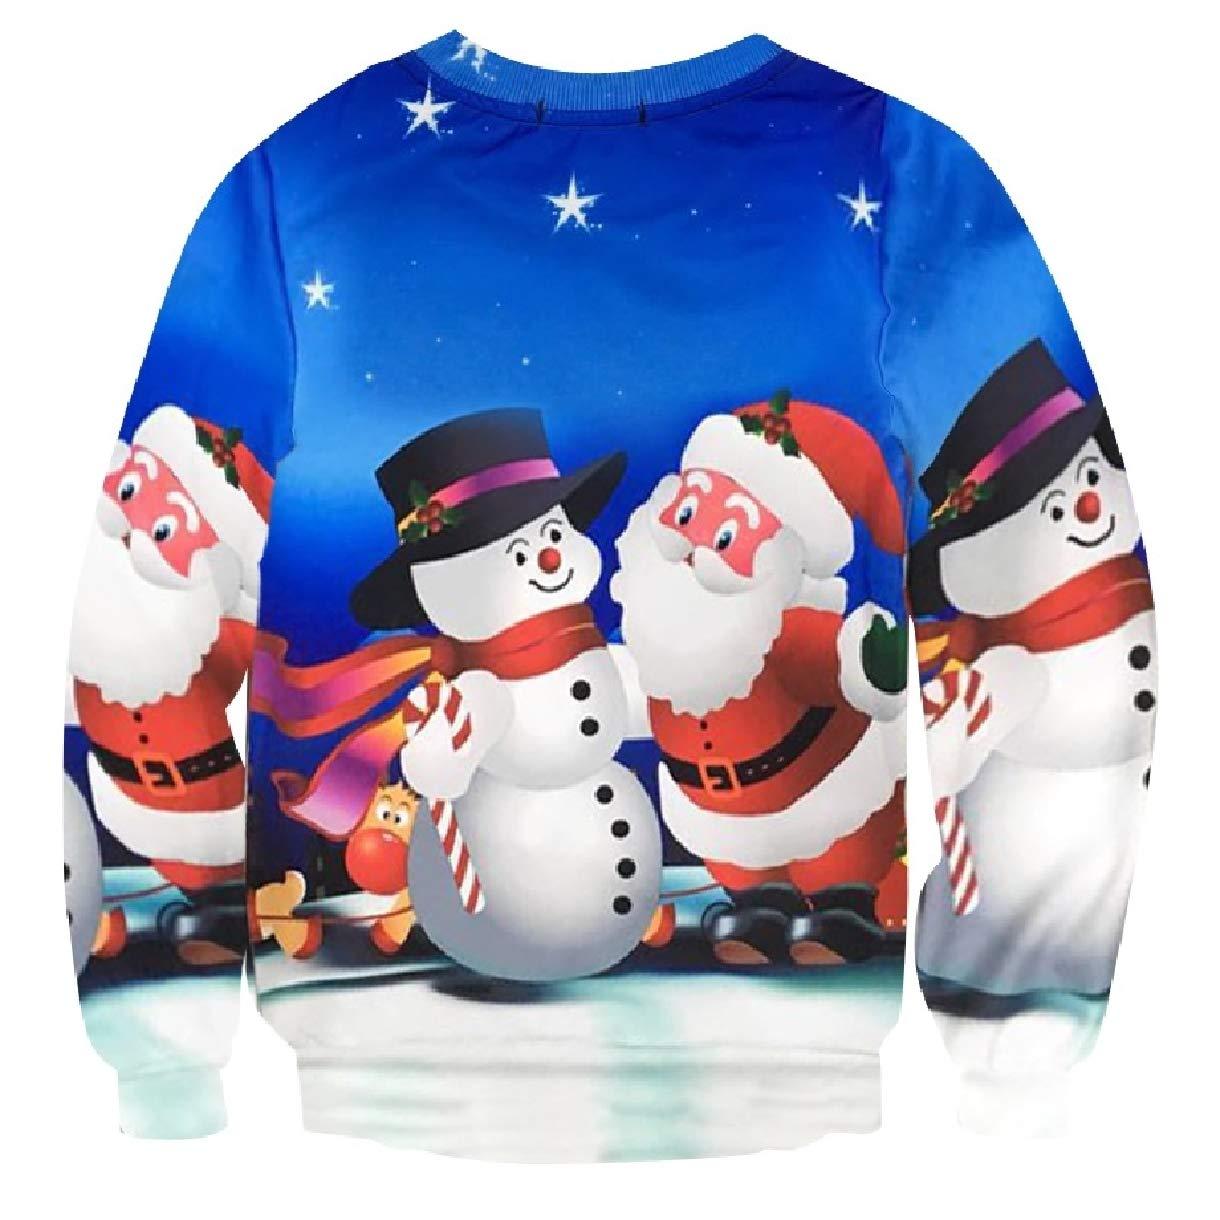 Highisa Mens Fall Winter Plus-Size Christmas Xmas Crew Neck Sweatshirts